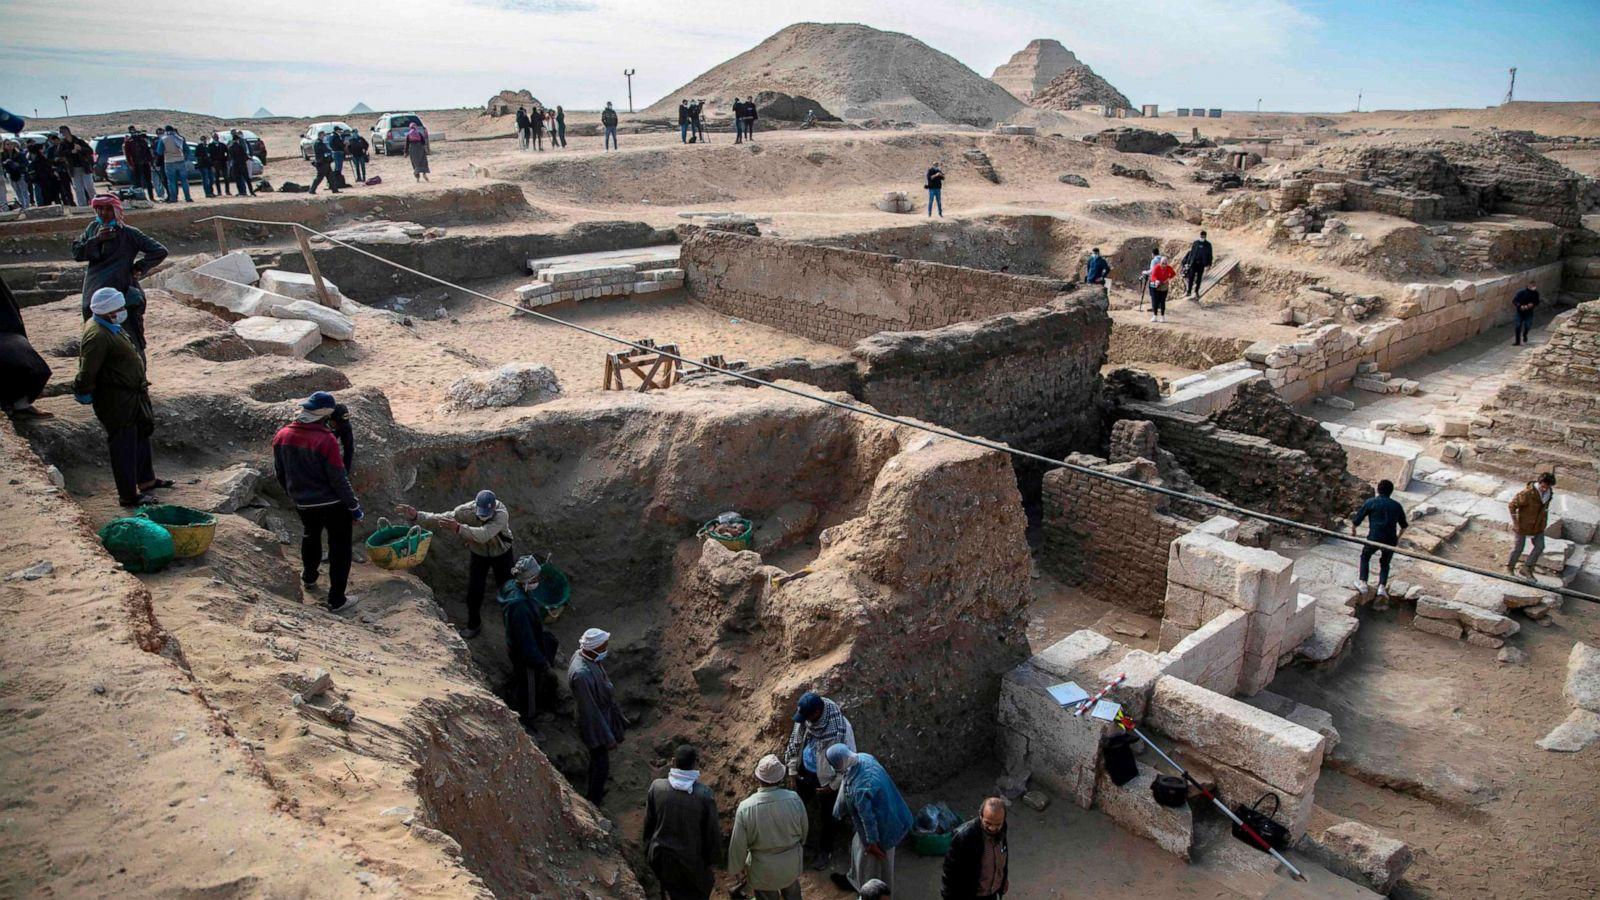 Egypt Unlocks More Secrets In Saqqara With Discovery Of Temple Sarcophagi Abc News